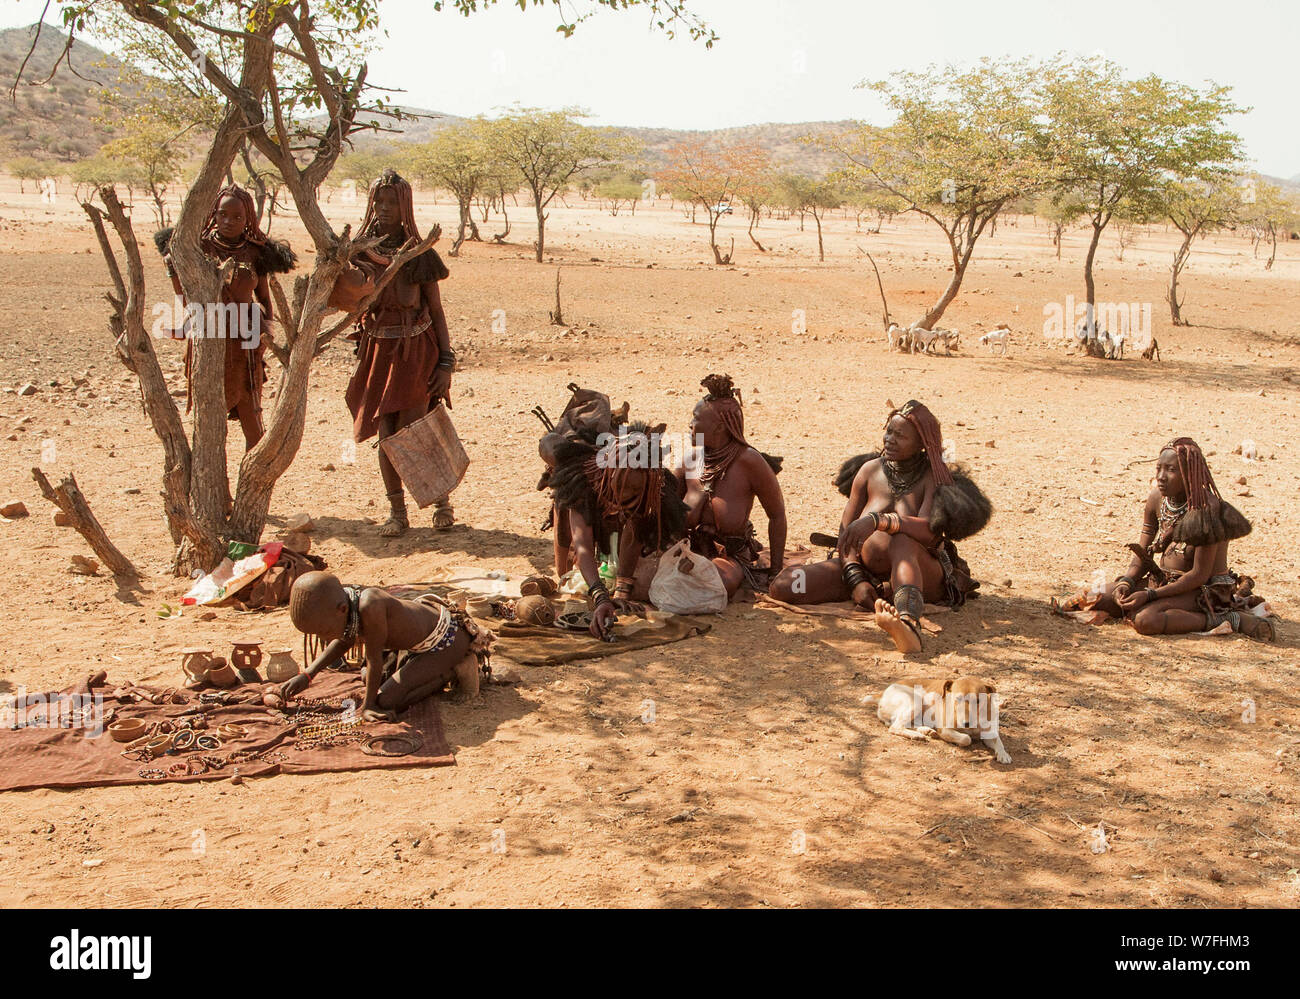 Himba tribe village, Kaokoveld, Namibia, Africa Stock Photo